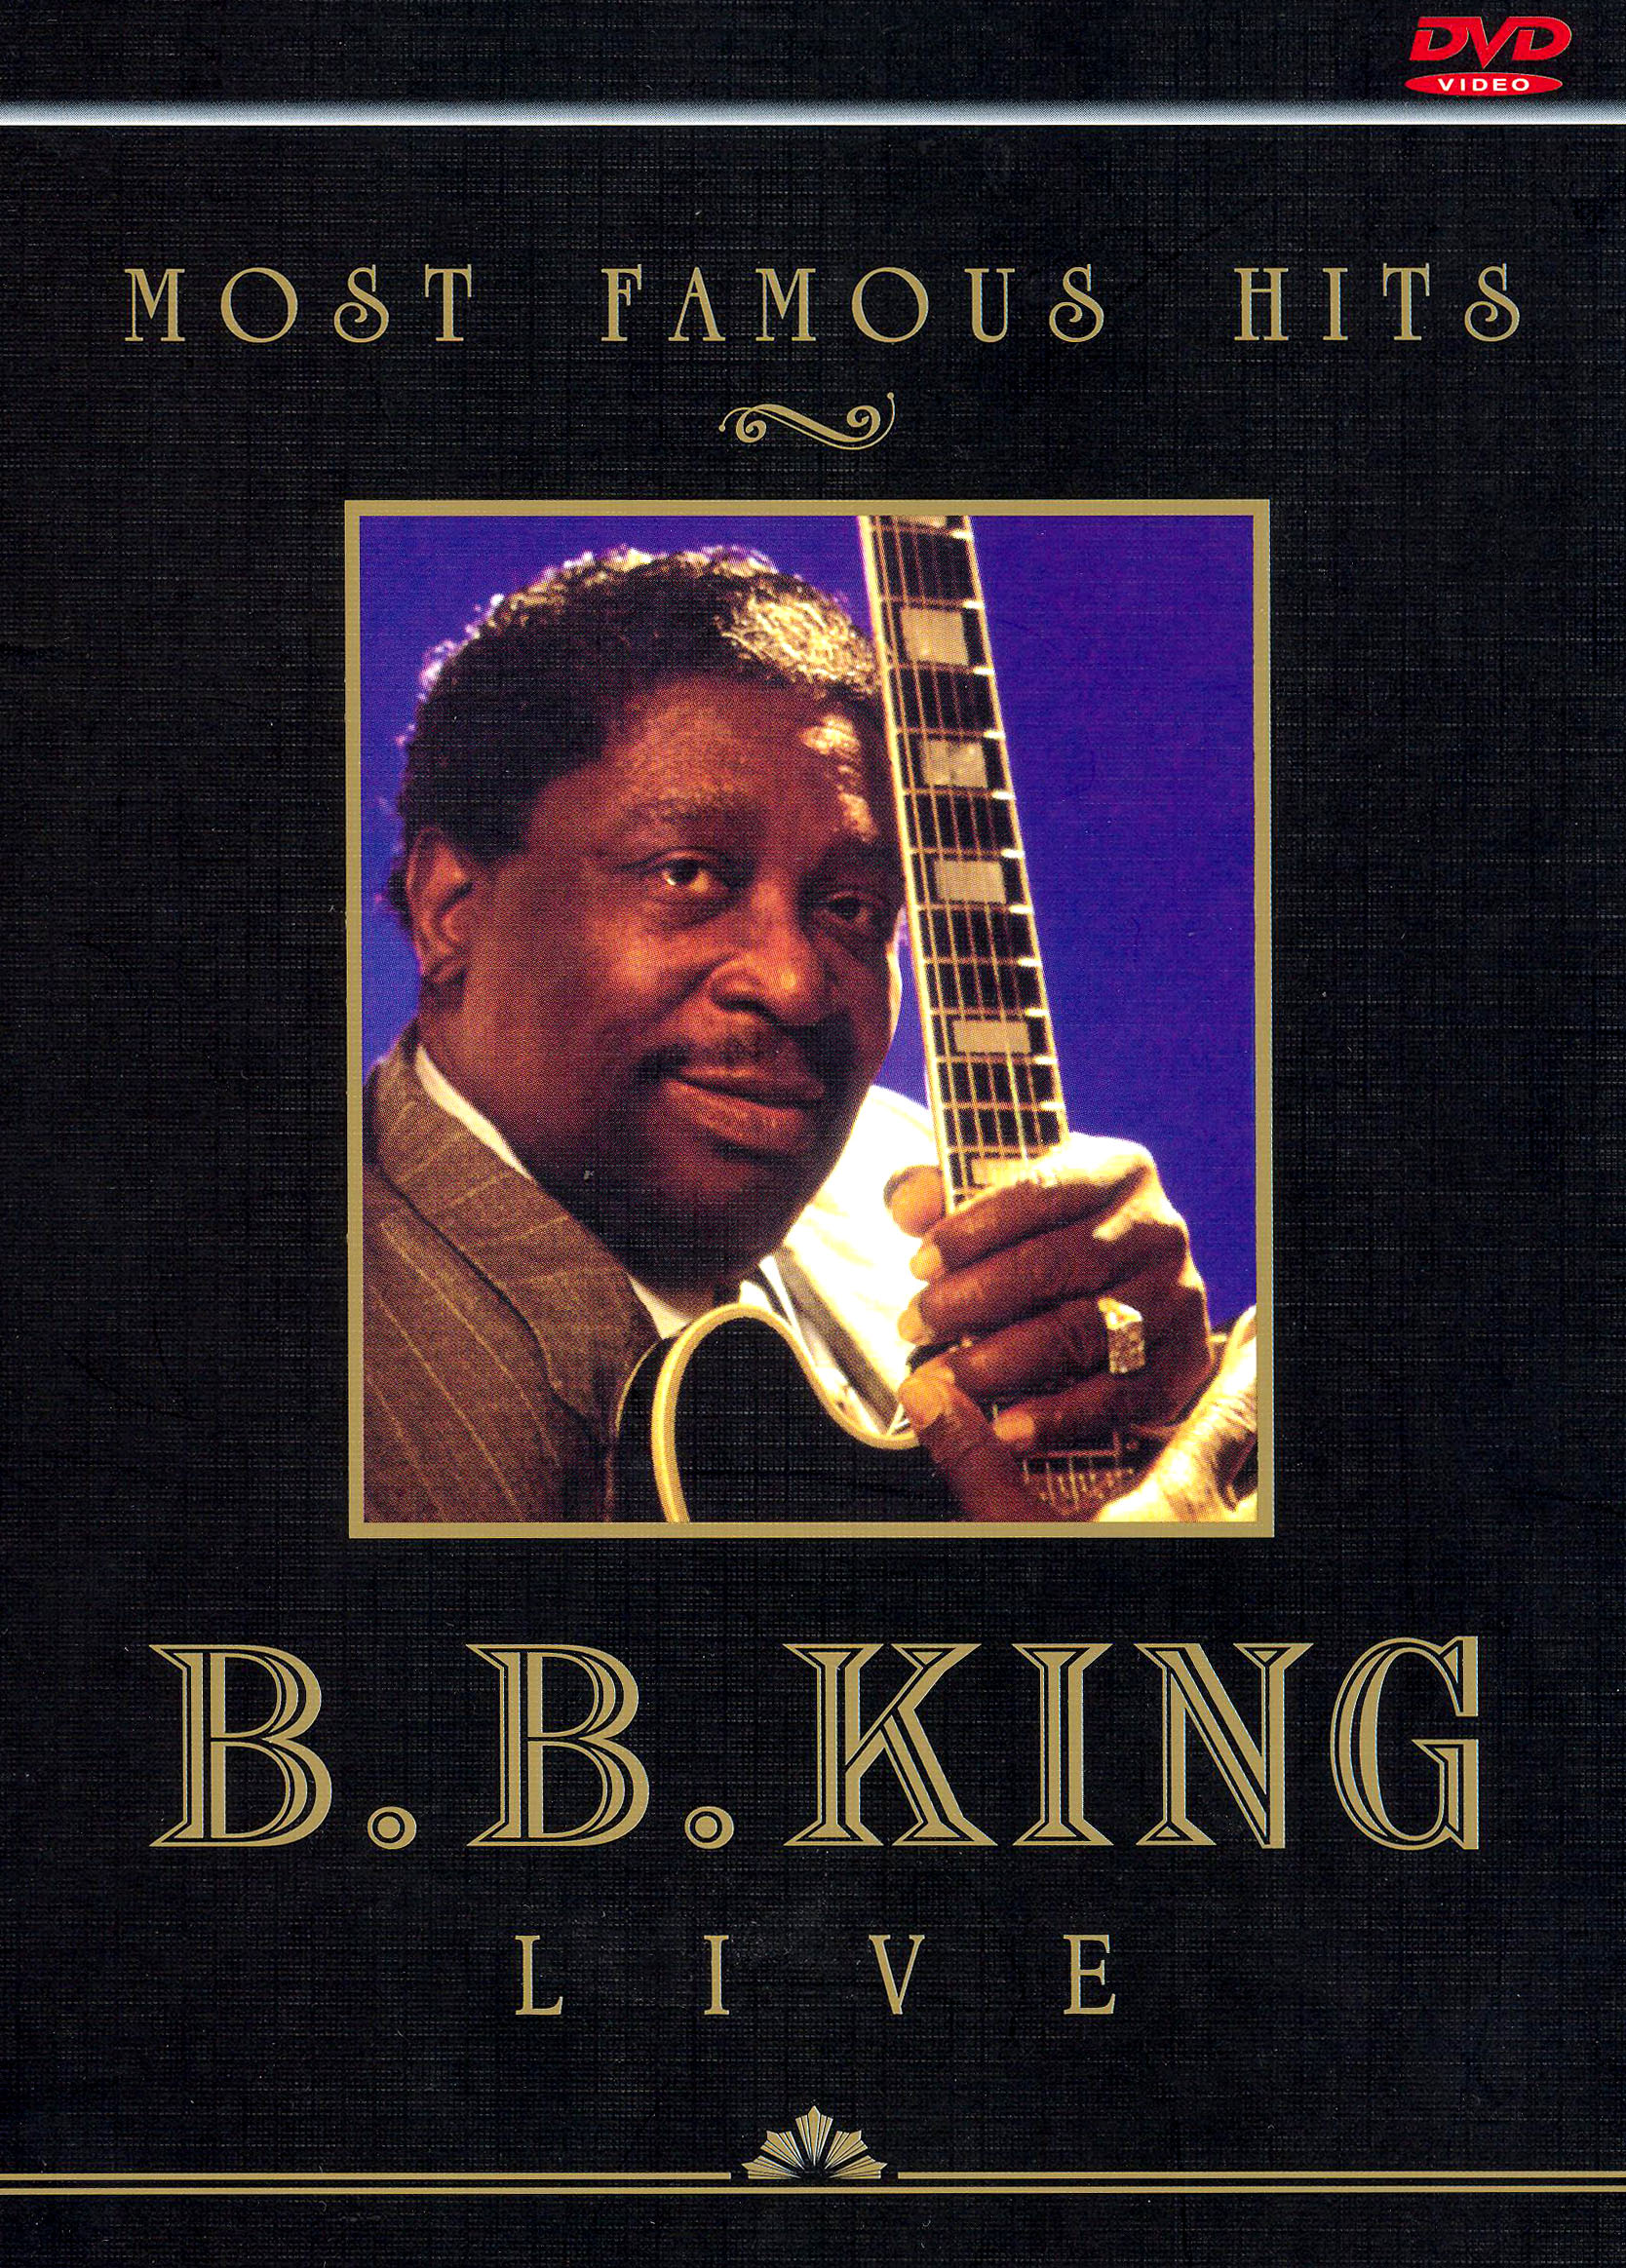 Most Famous Hits: B.B. King Live